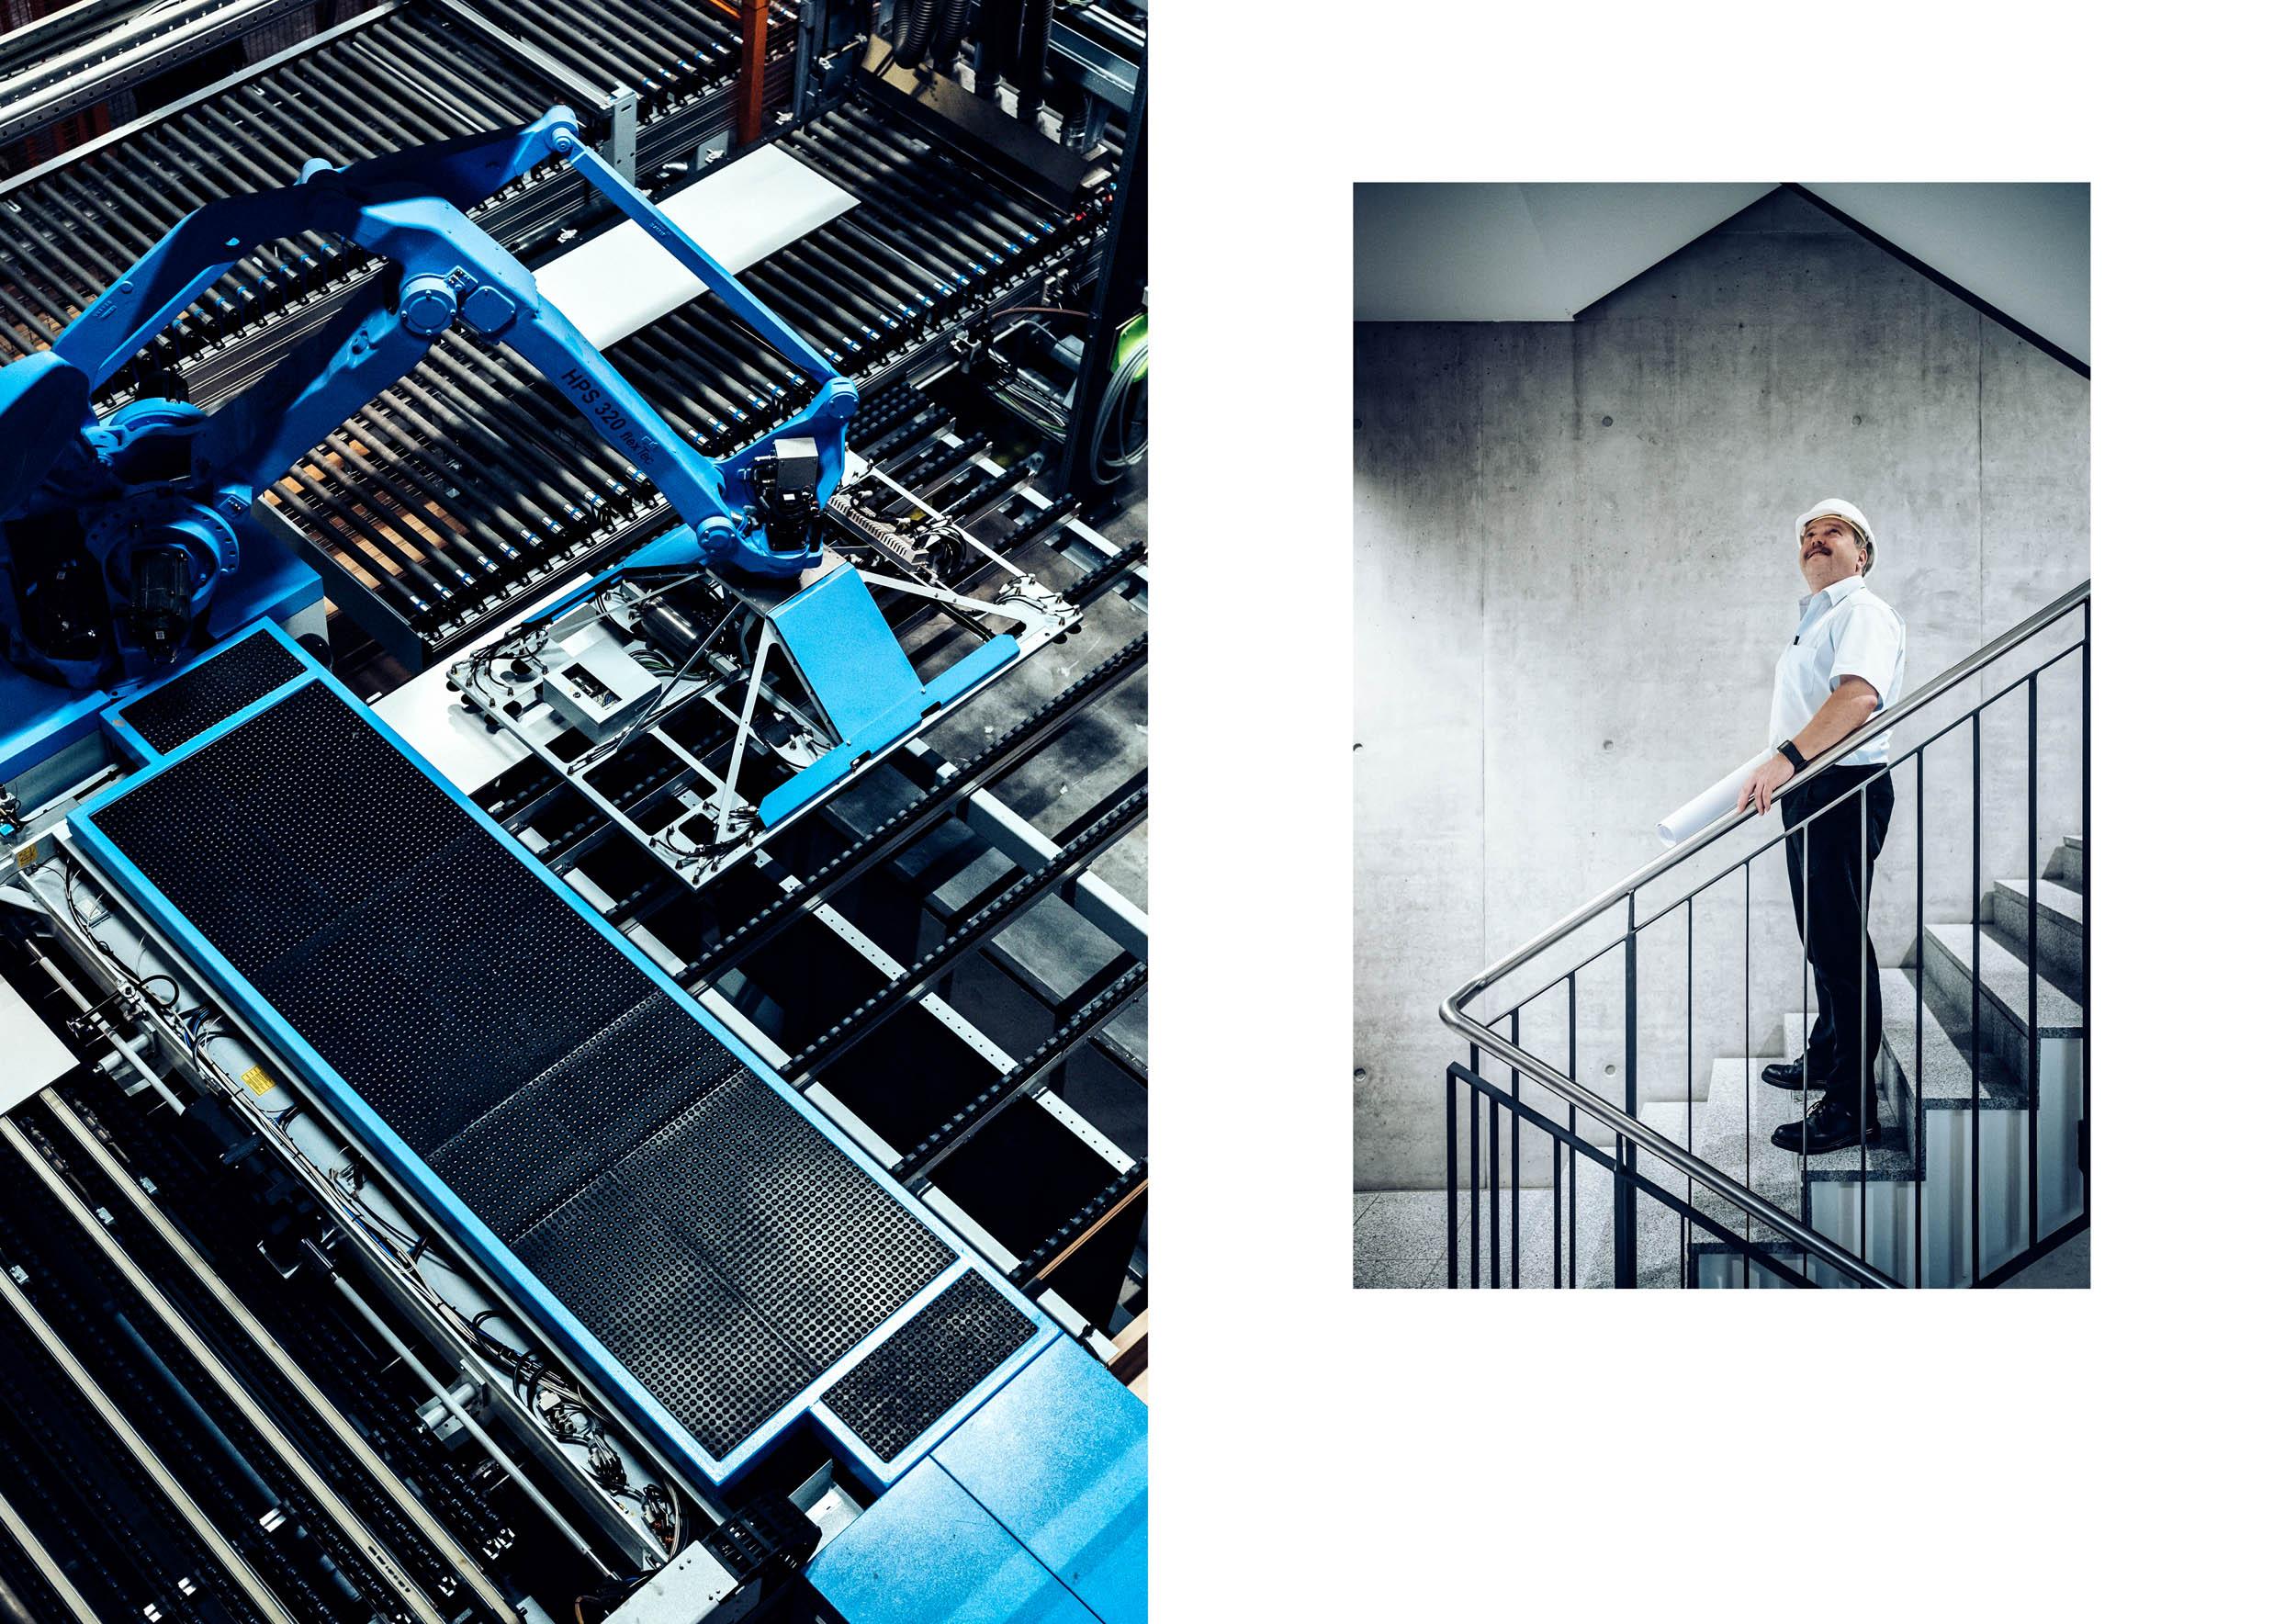 2018_SeifertUebler_schueller_kuechen_corporate_portrait_industrial_photography_011.jpg